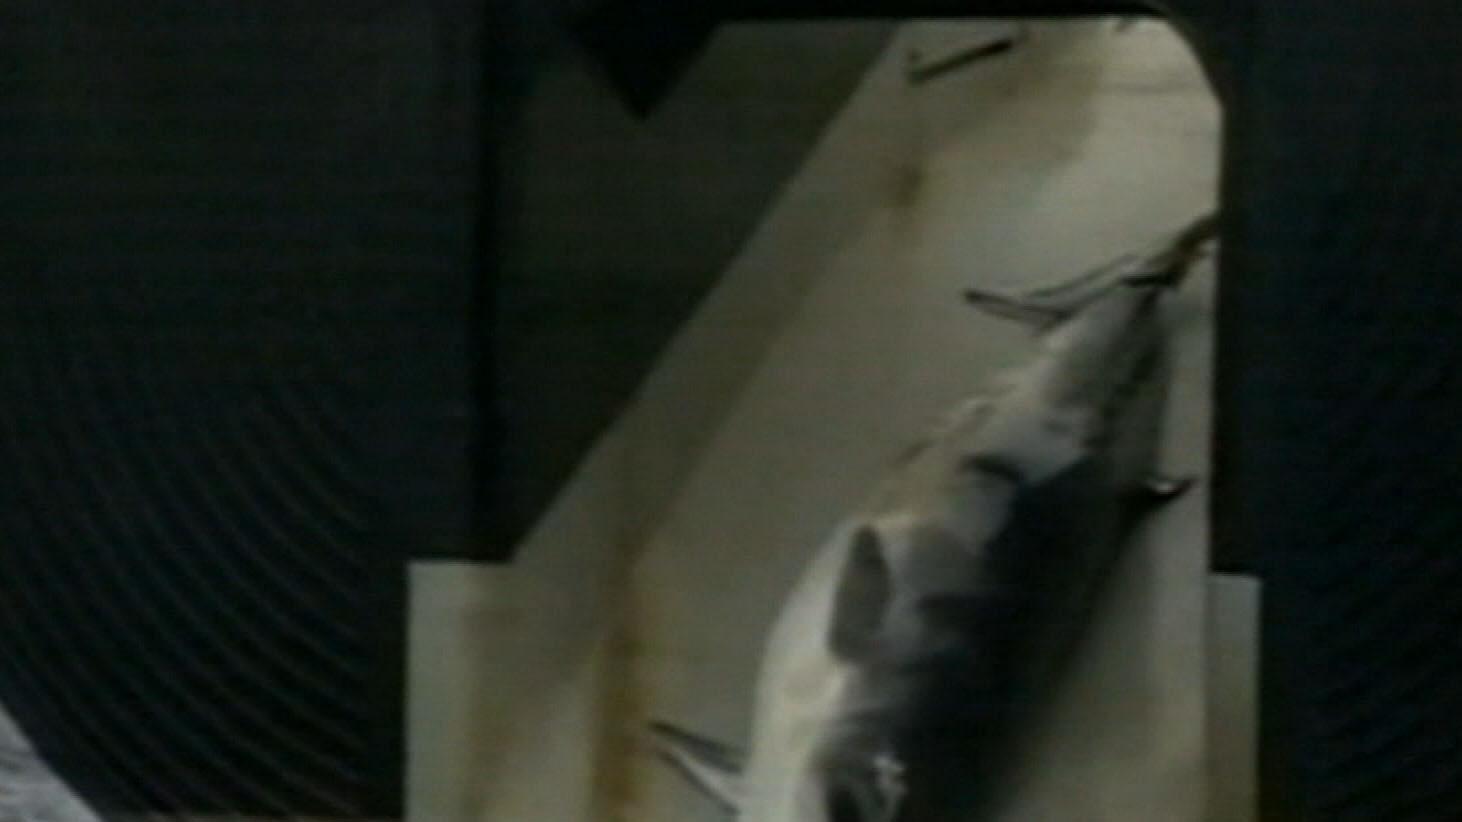 Celebrating with sake, Japan whalers bring ashore catch